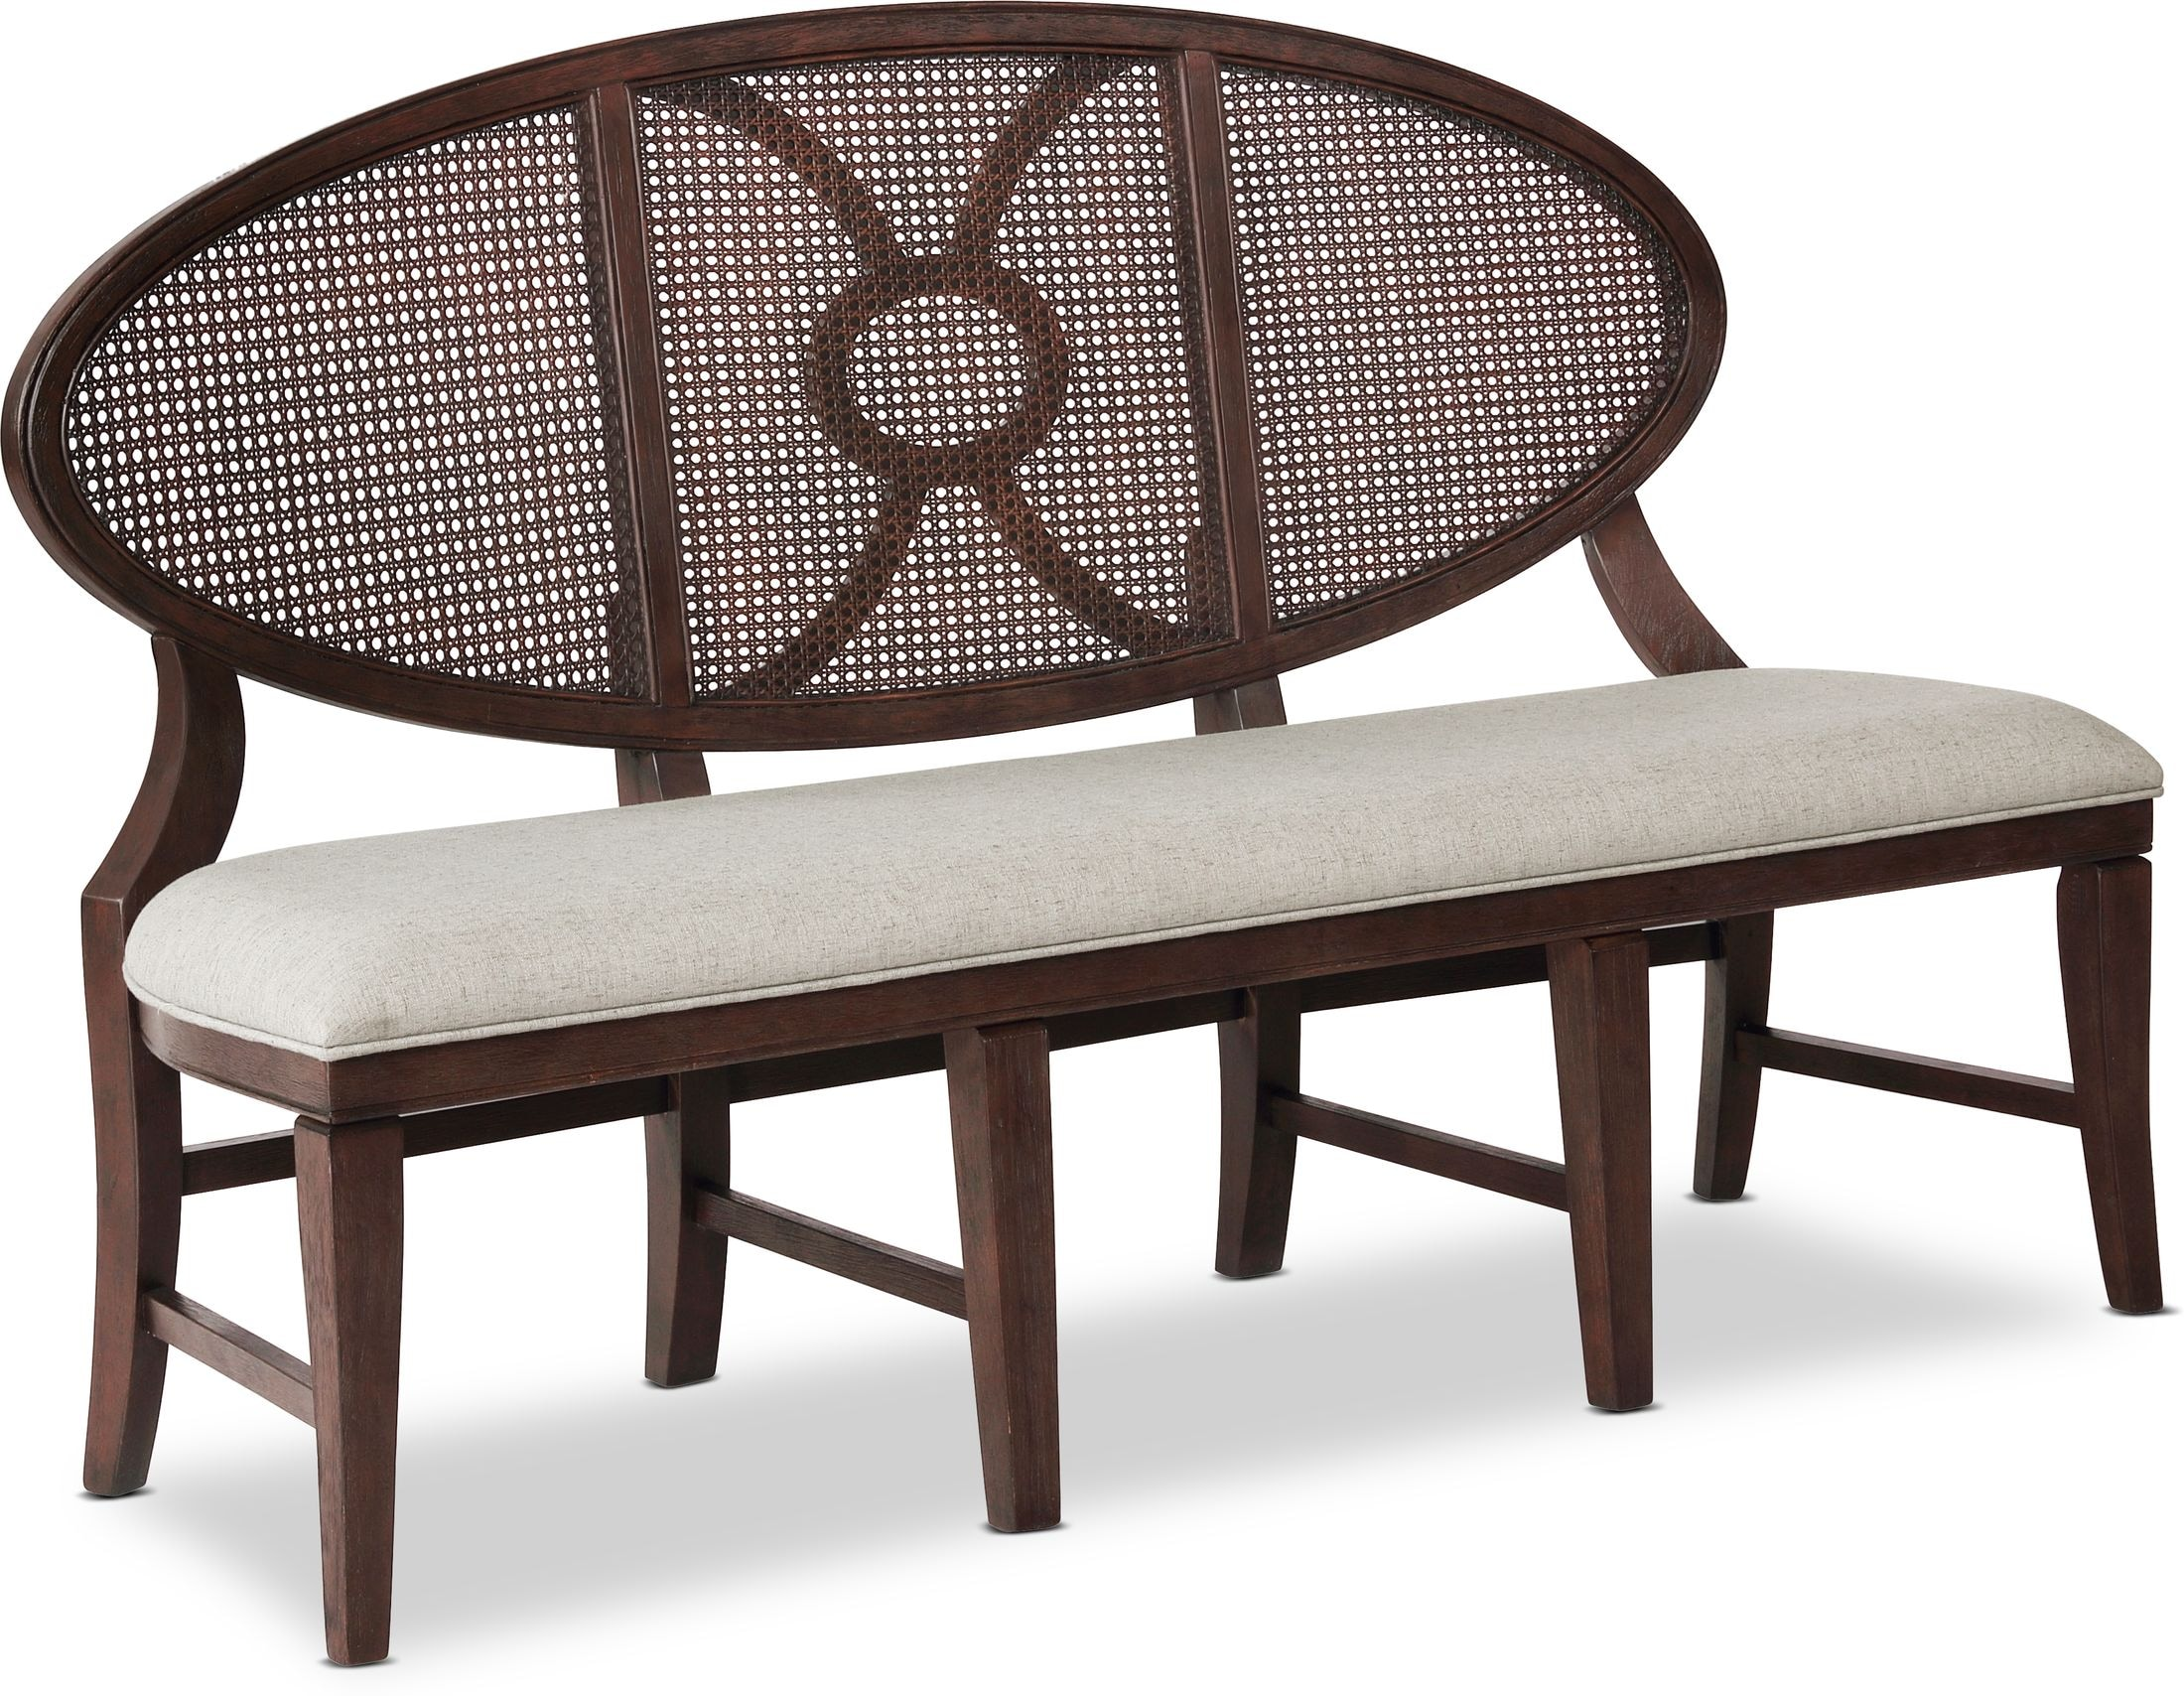 Dining Room Furniture - Wilder Bench